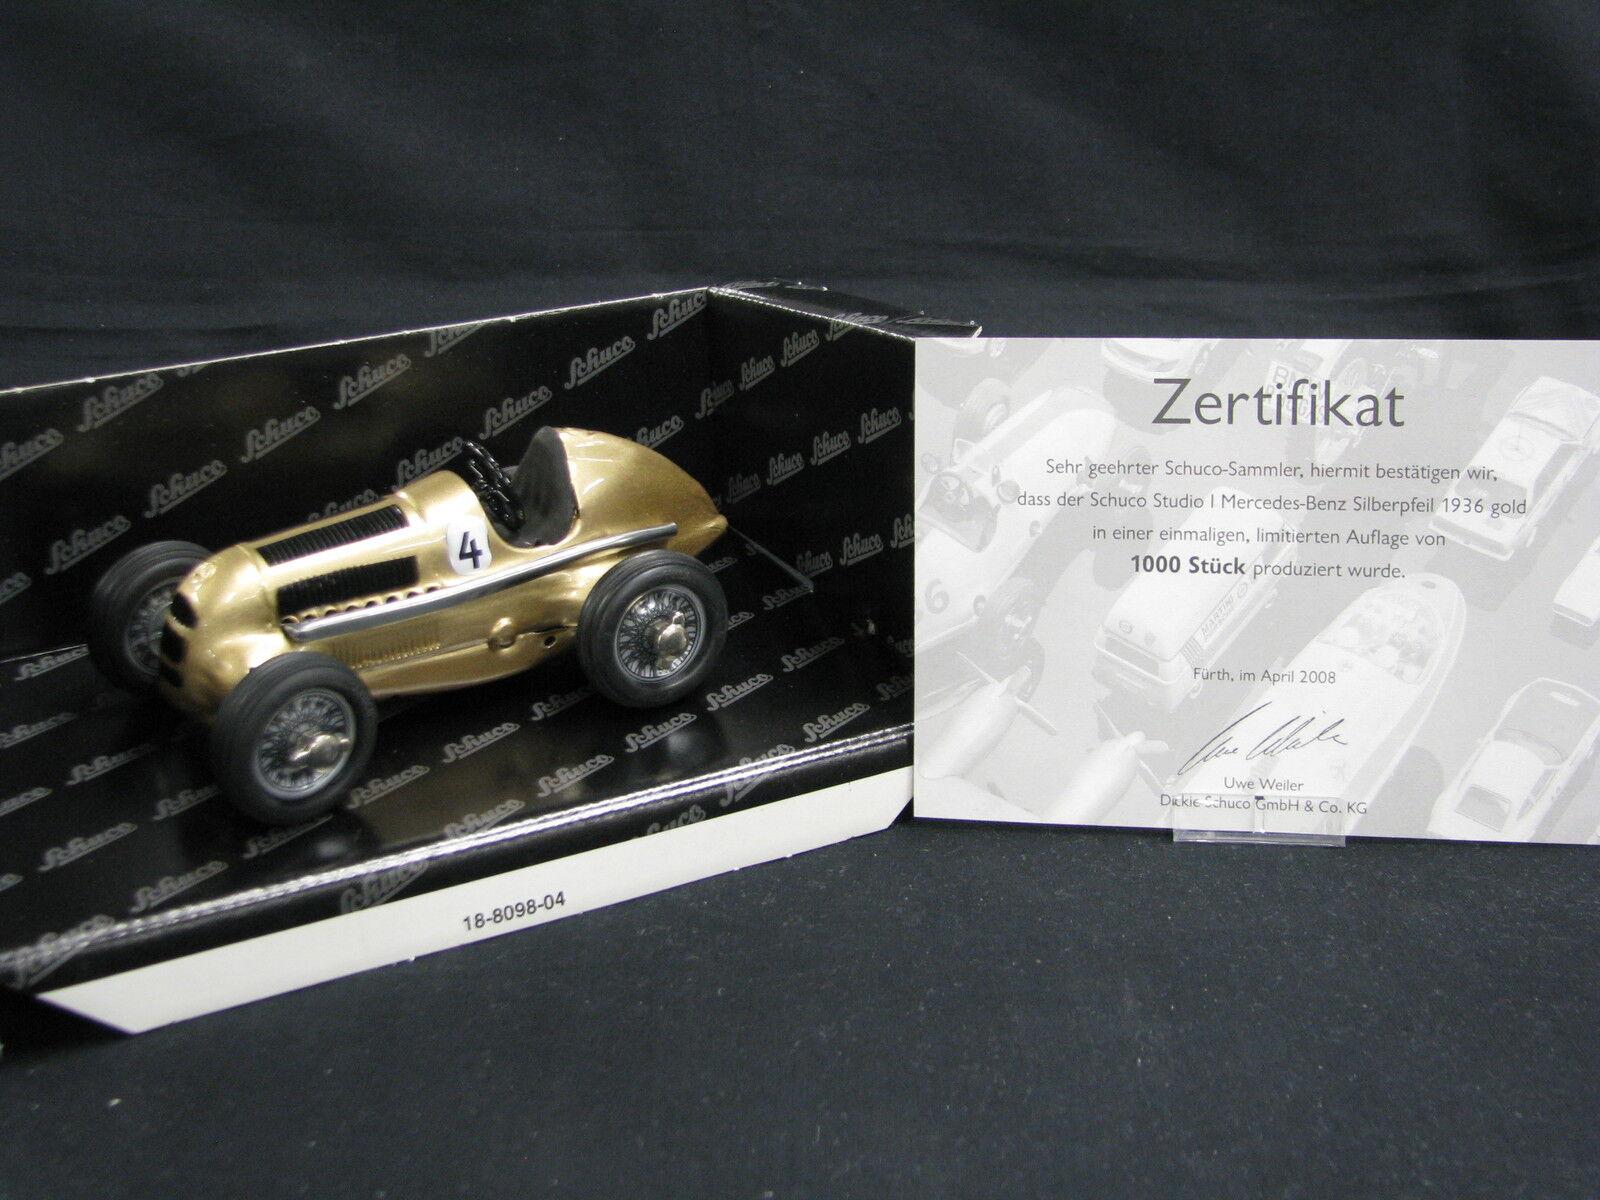 Schuco Studio l Mercedes-Benz Silberpfeil 1936 1 24 Gold  4 (JS)